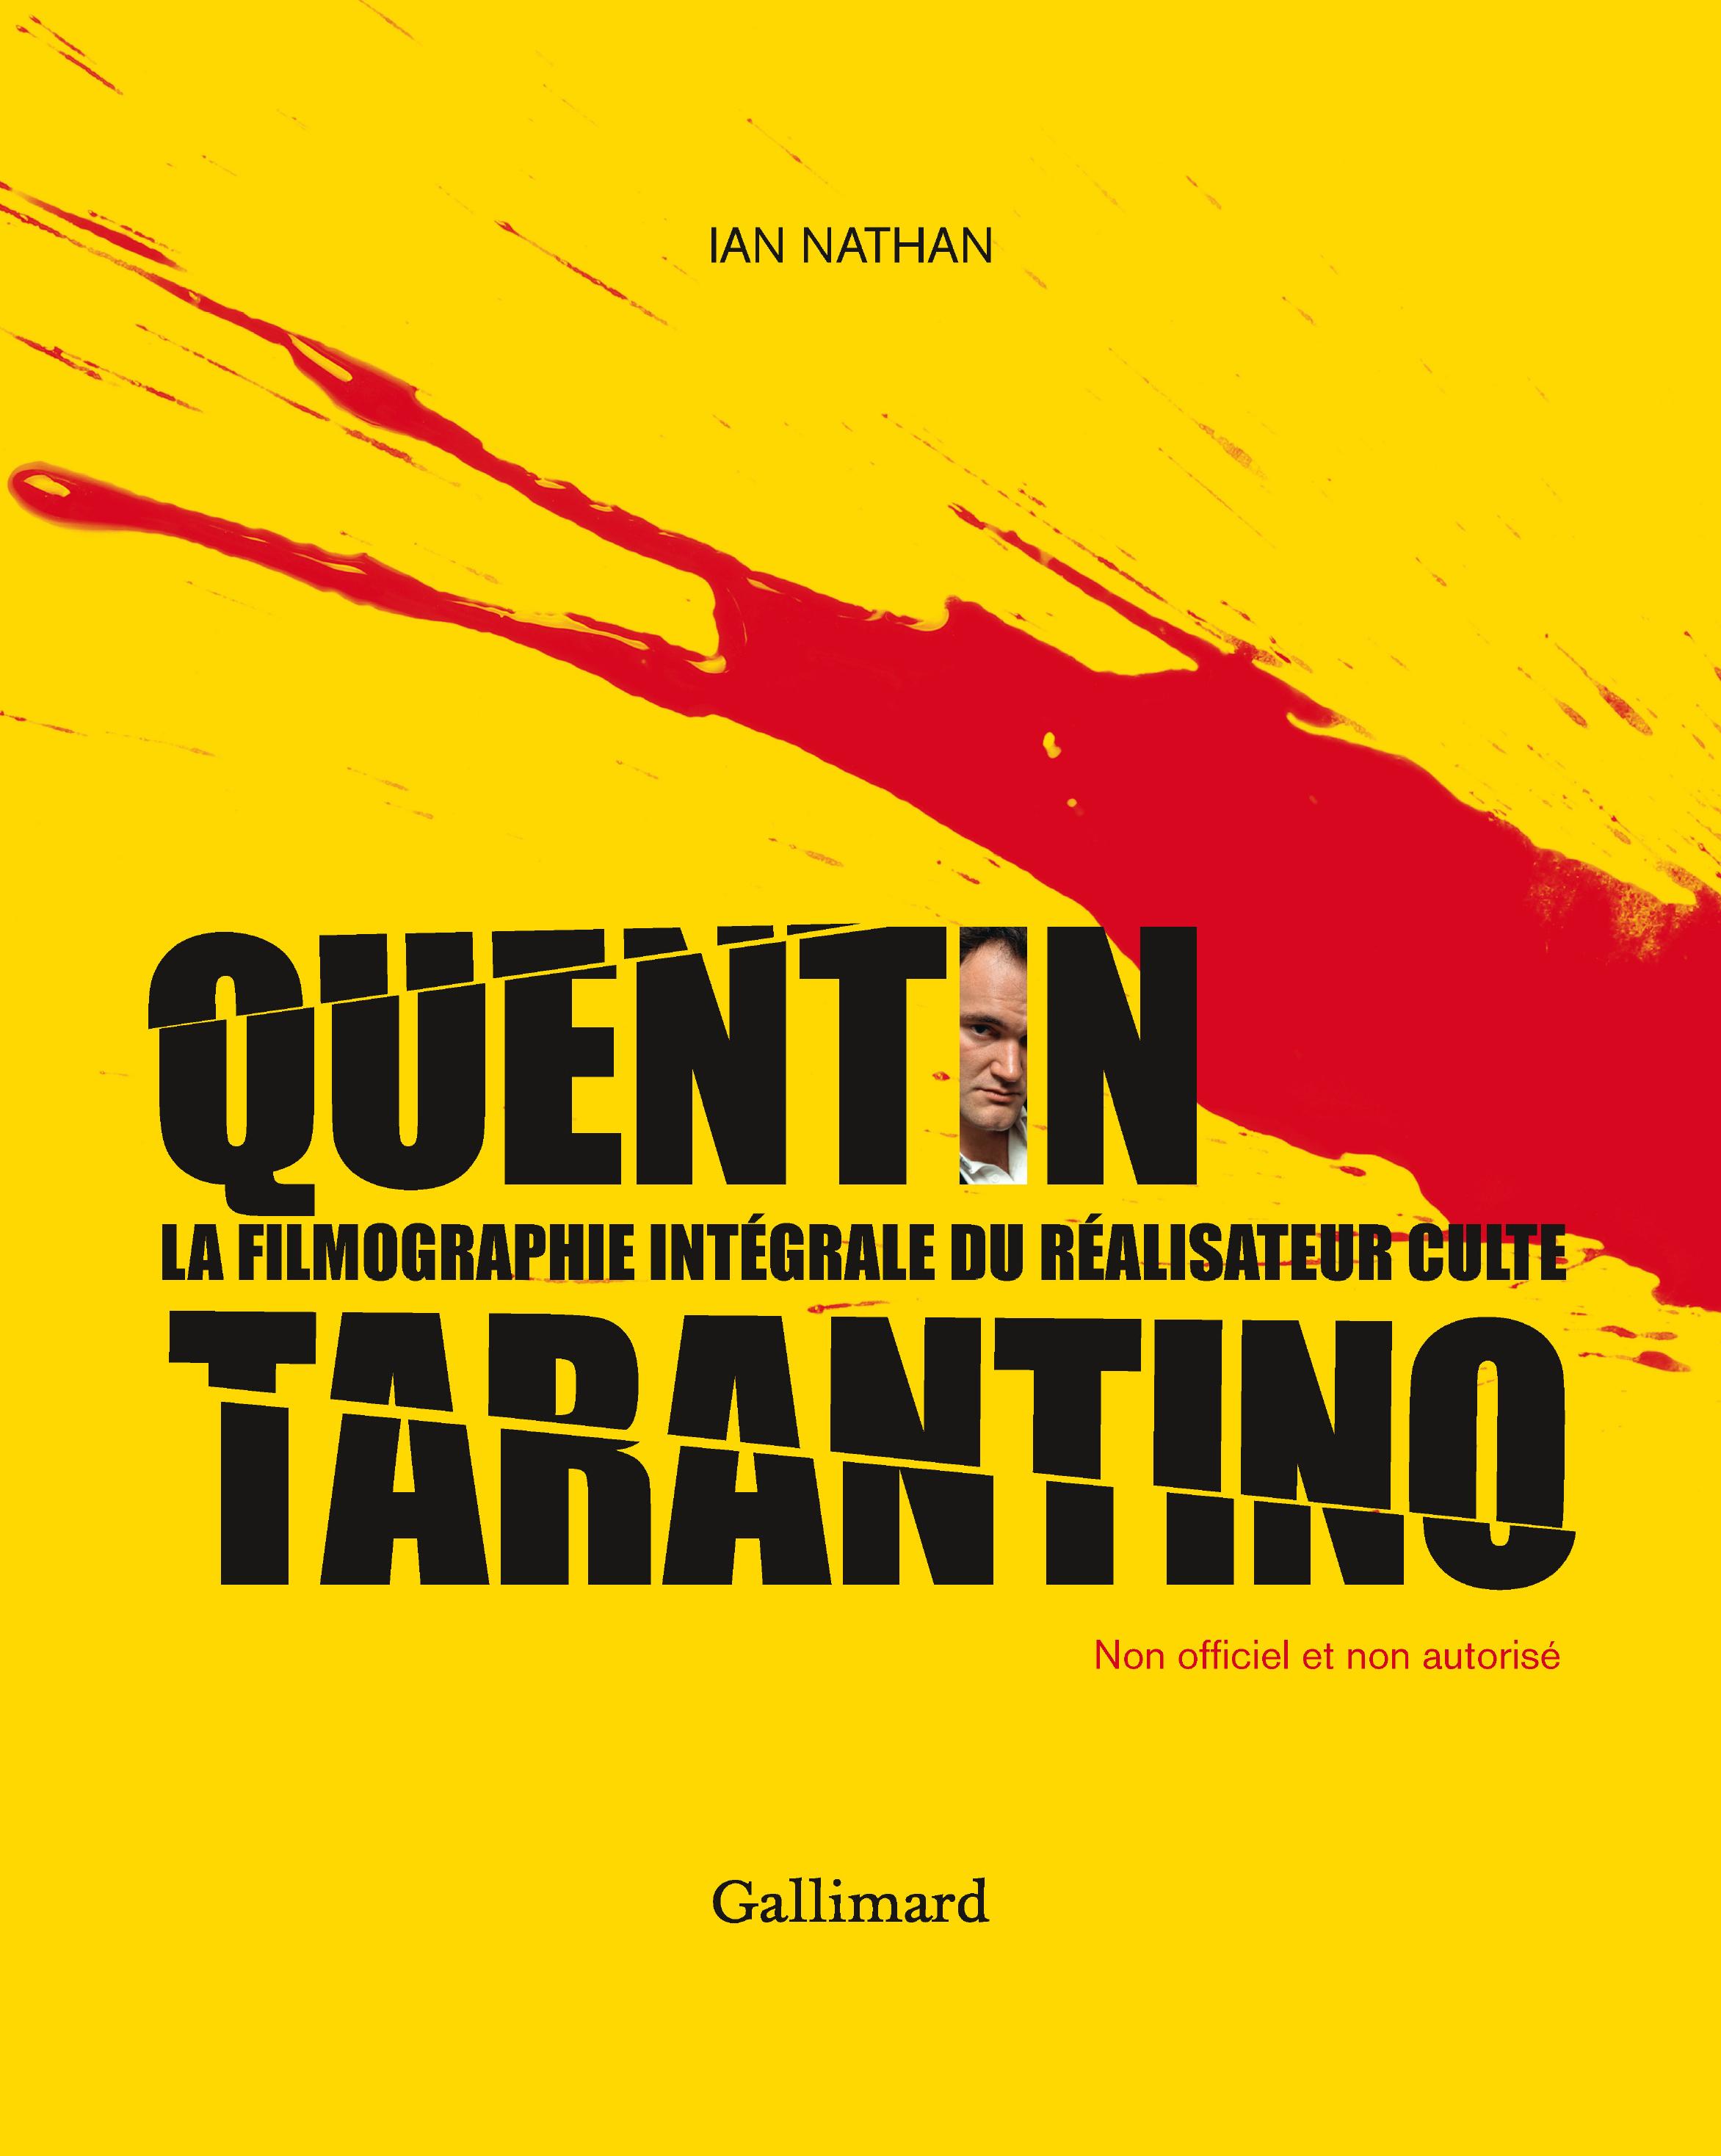 QUENTIN TARANTINO - LA FILMOGRAPHIE INTEGRALE DU REALISATEUR CULTE